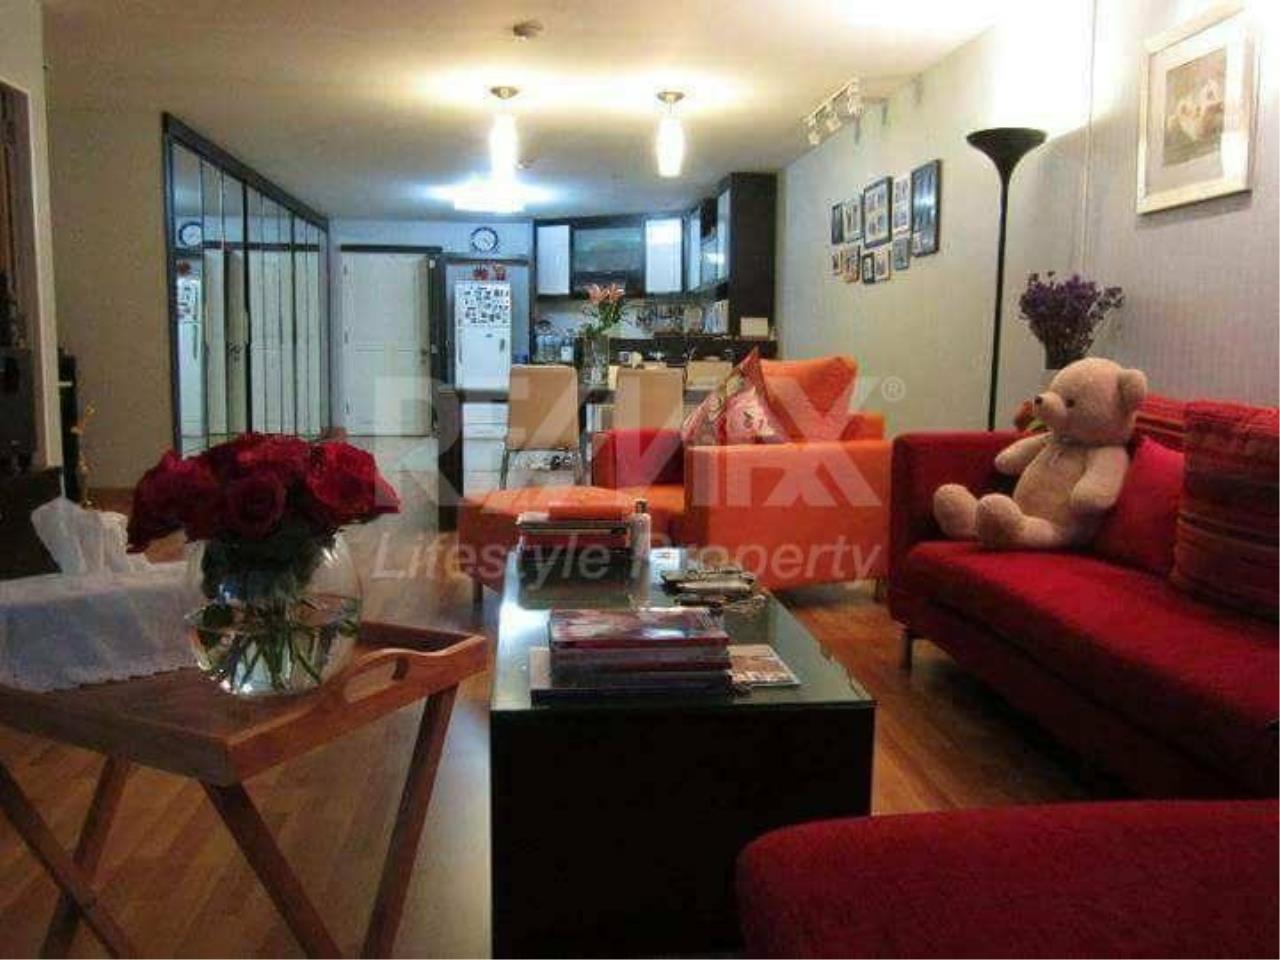 RE/MAX LifeStyle Property Agency's Casa Viva 3